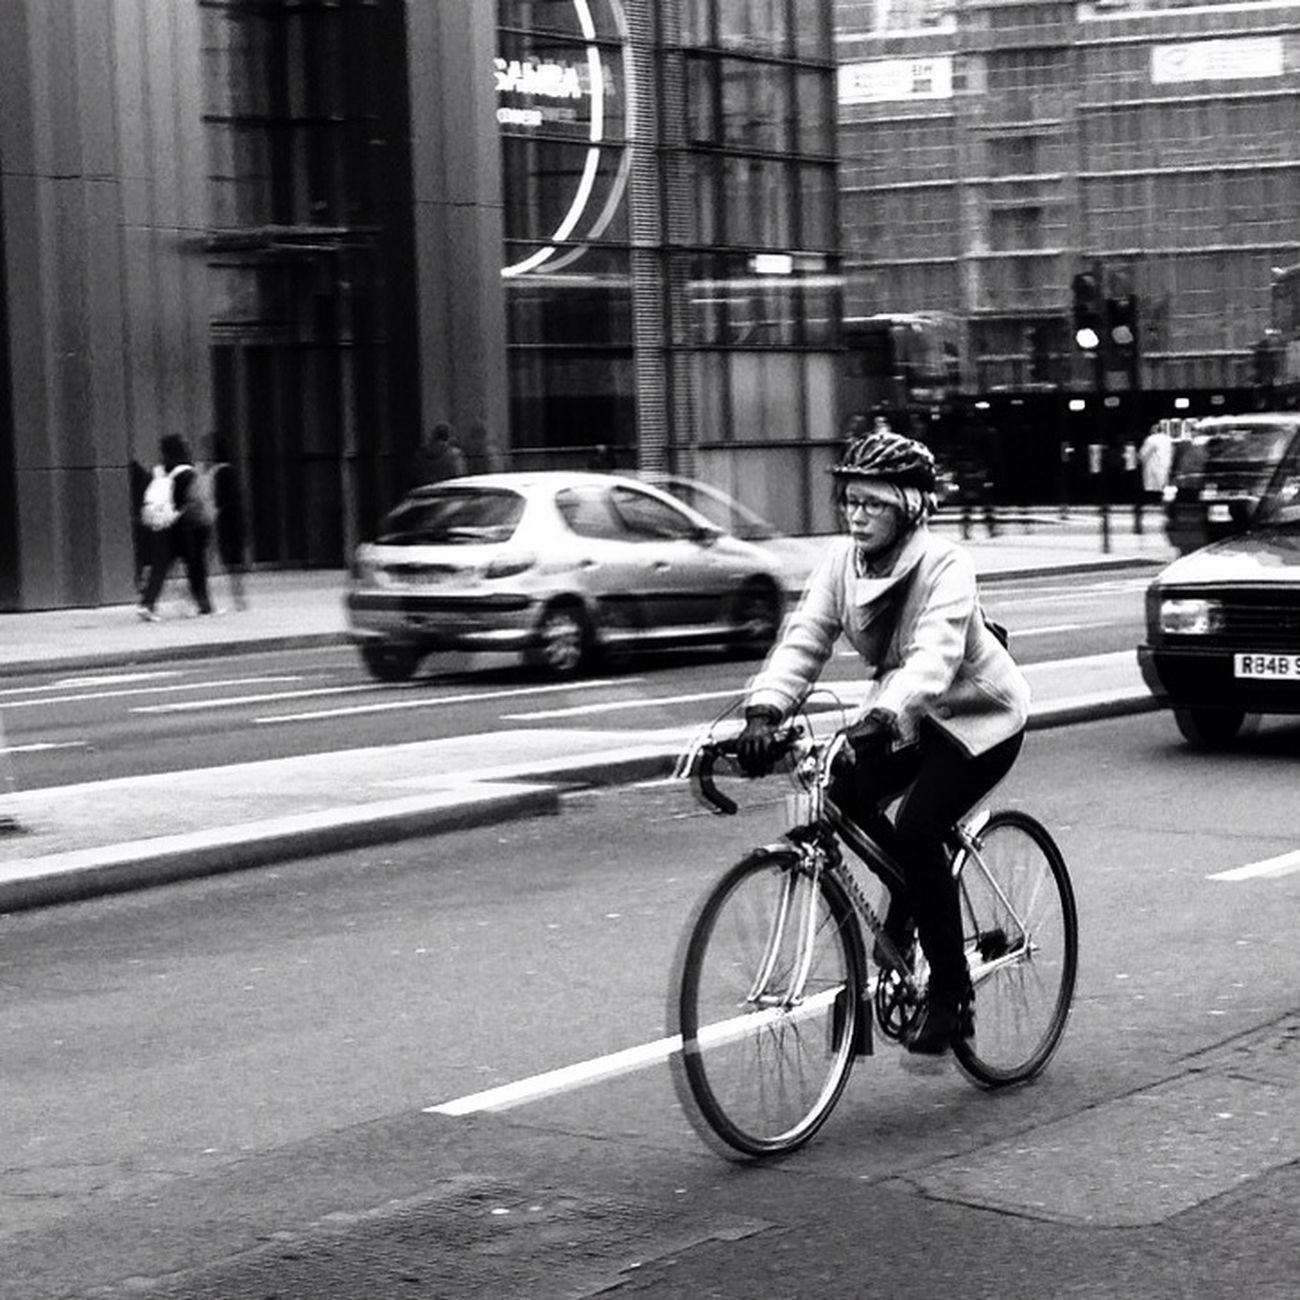 transportation, land vehicle, mode of transport, bicycle, street